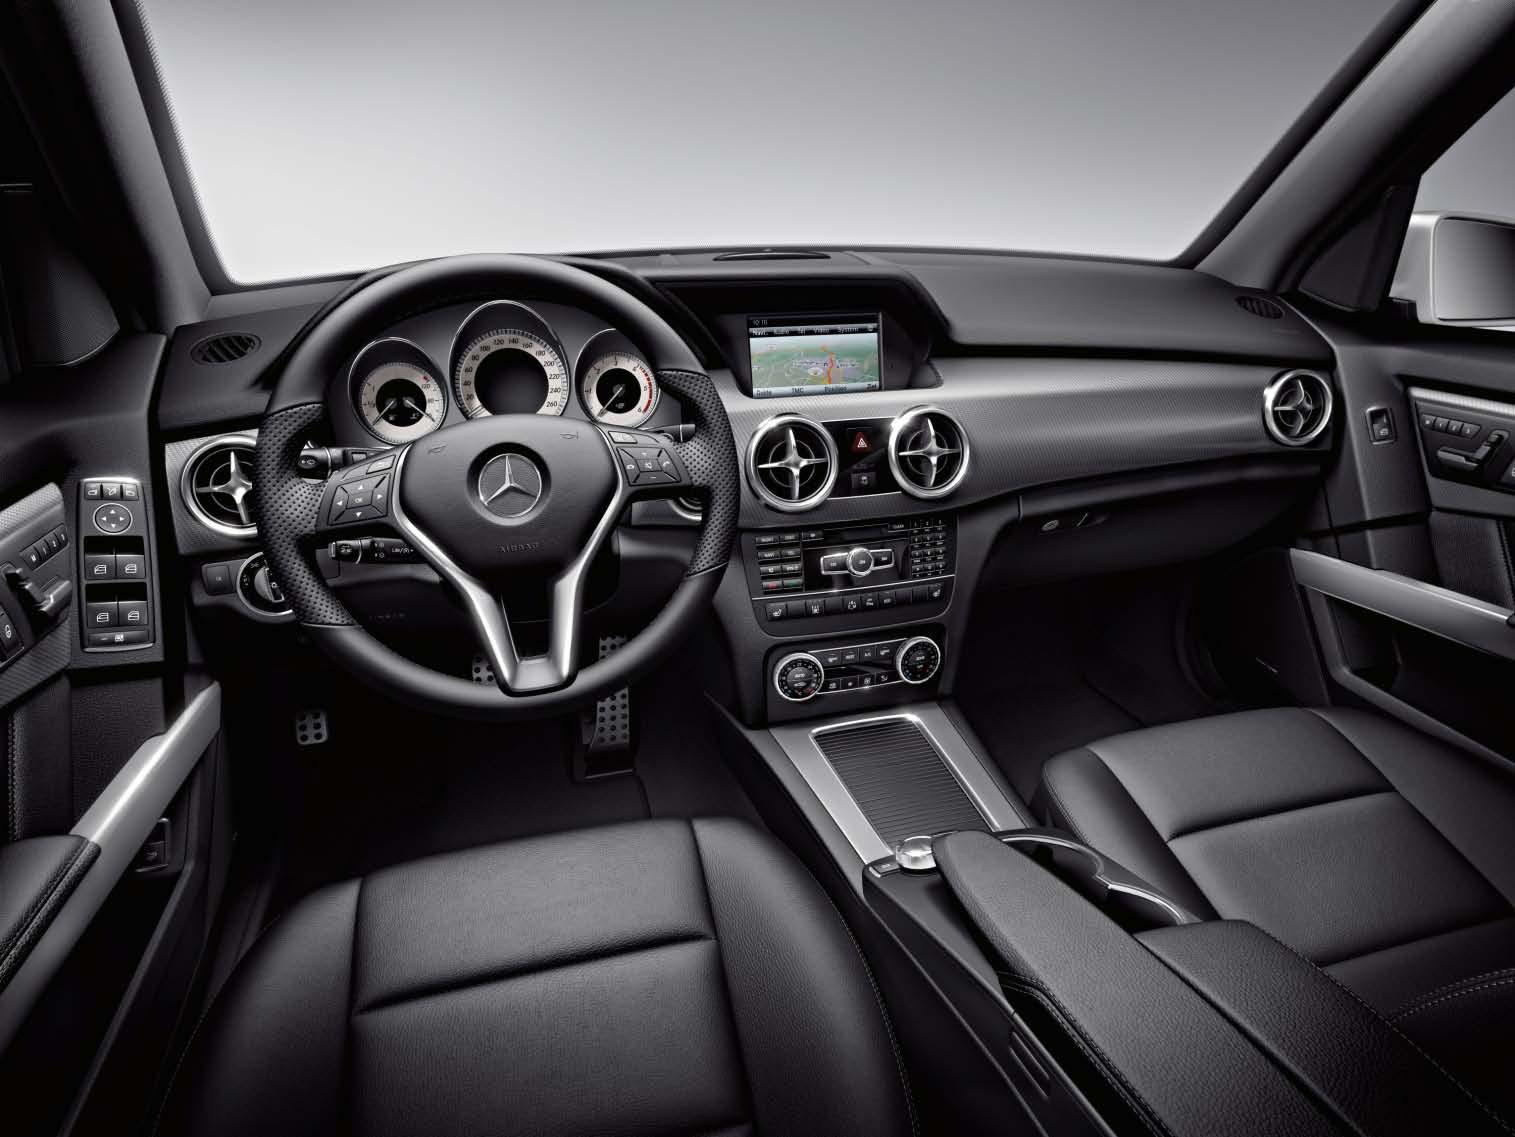 2013 GLK 350 Bold Interior Combinations. | Mercedes-Benz \'Meki\'smerc\'